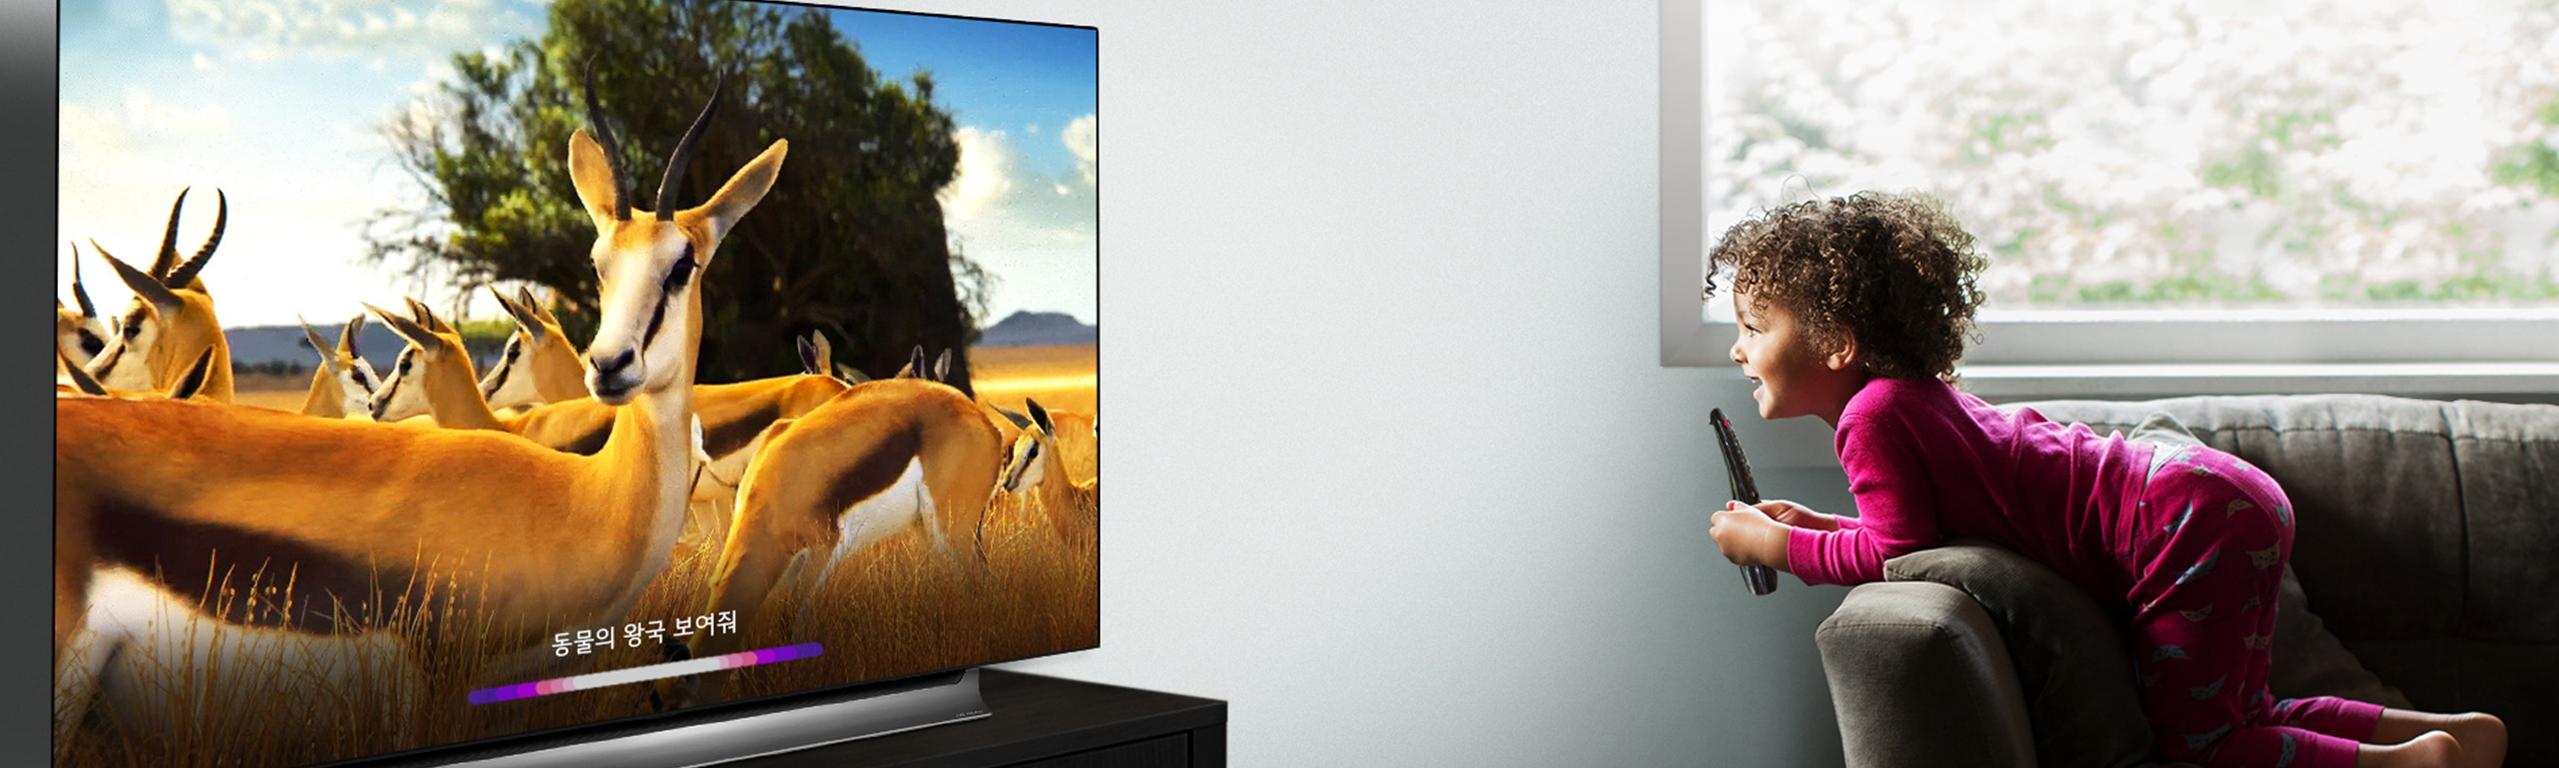 LG 올레드 TV AI ThinQ 생생후기 이벤트